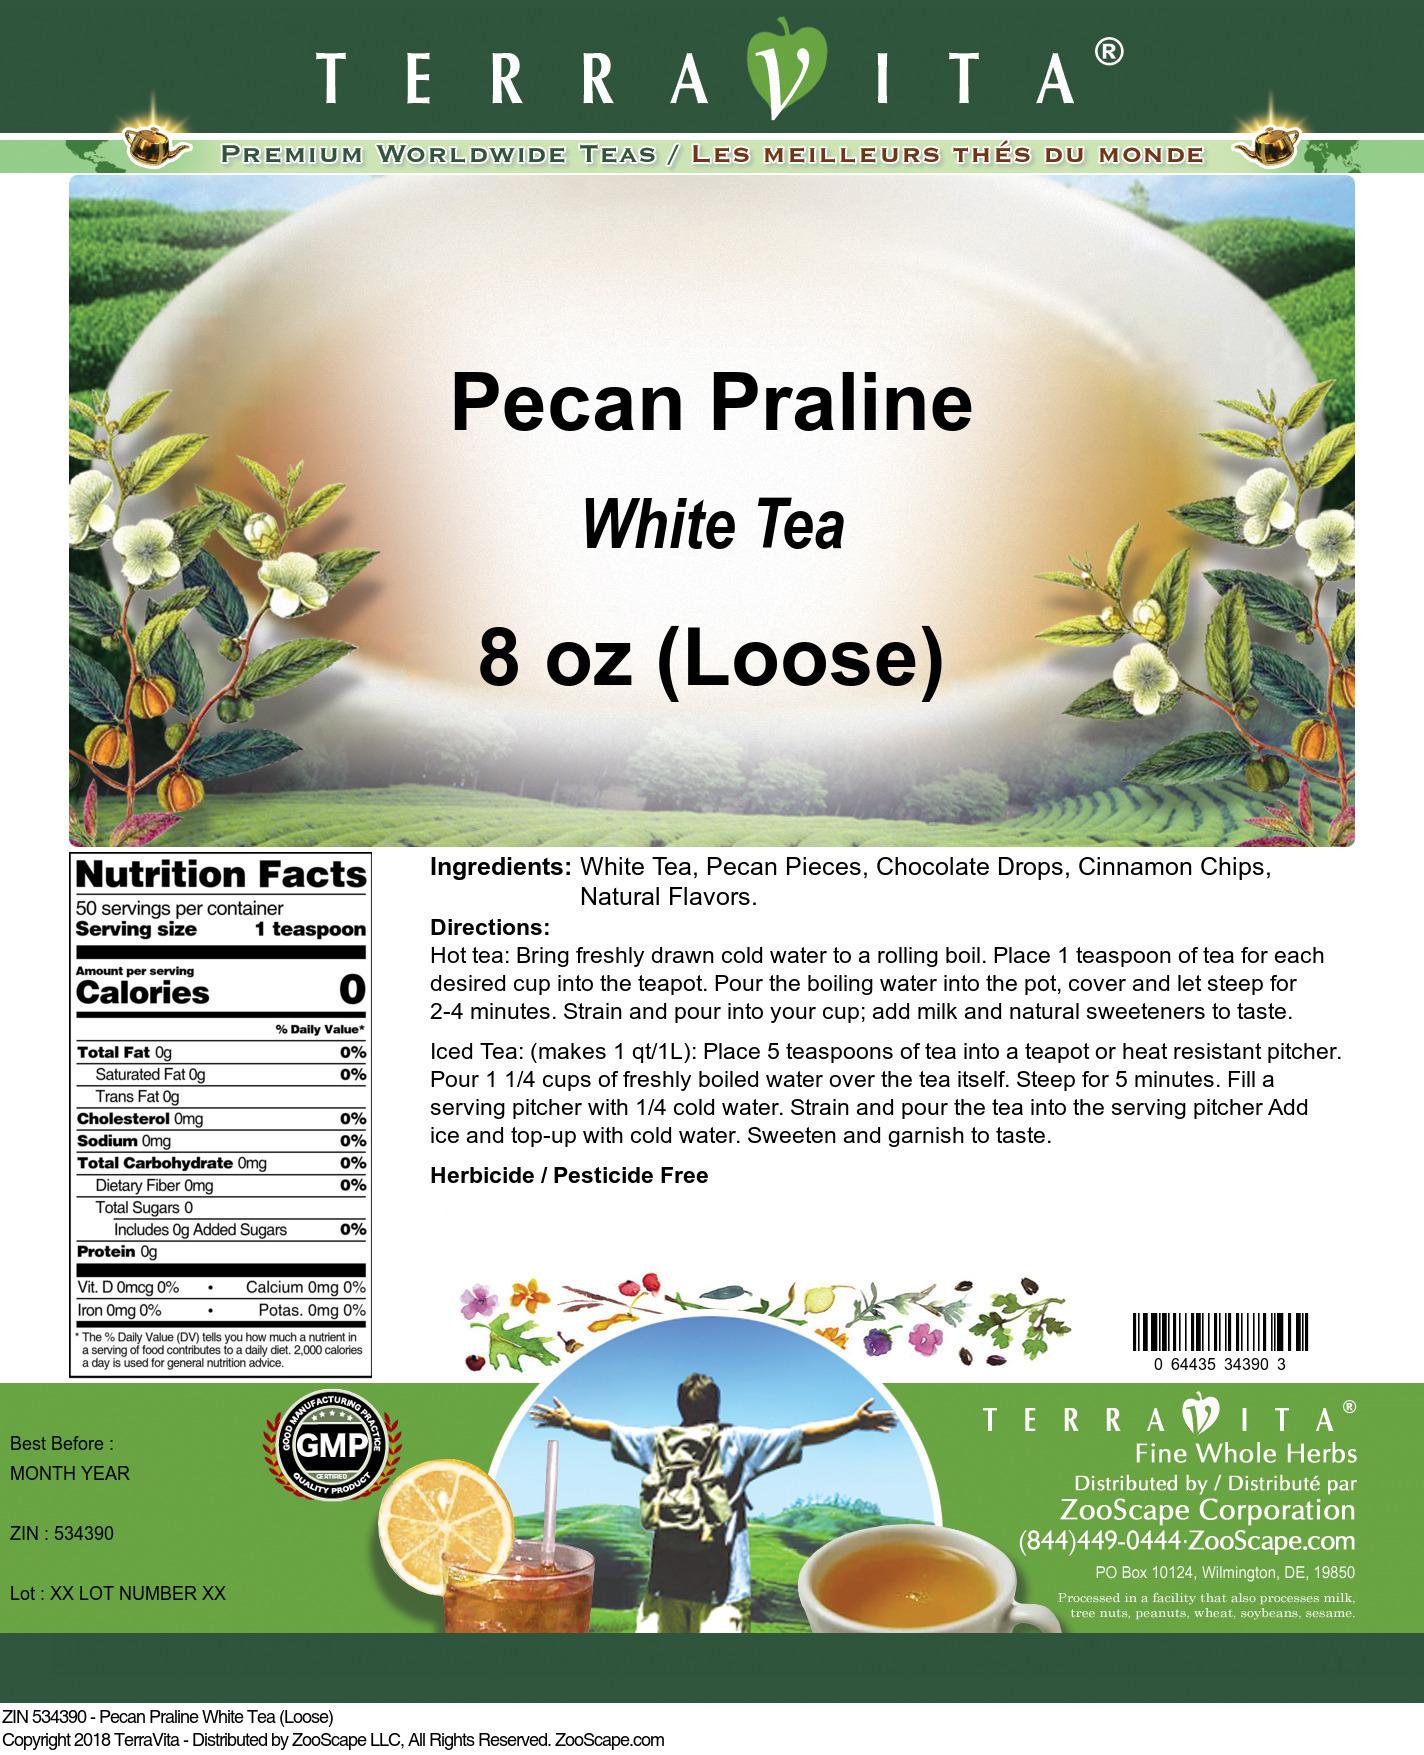 Pecan Praline White Tea